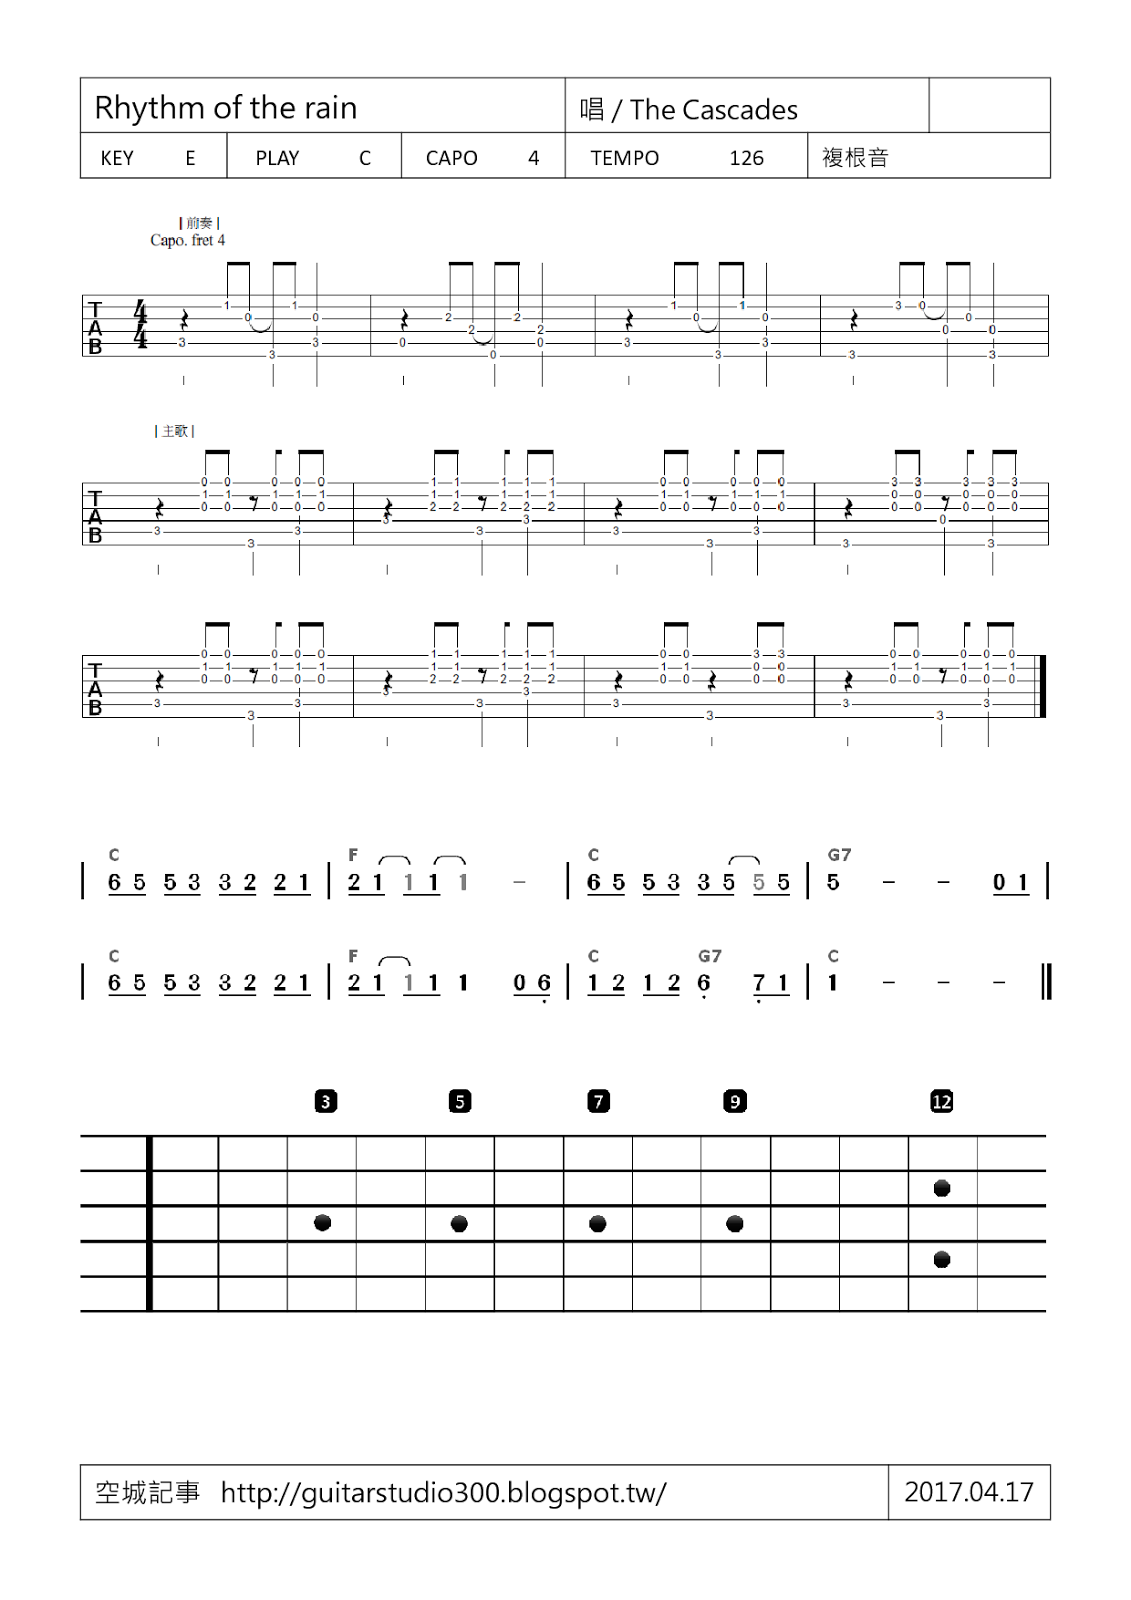 Rhythm of the rain - The Cascades |吉他譜|和弦譜|前奏六線譜編曲與主歌彈奏六線譜 ~ 空城記事